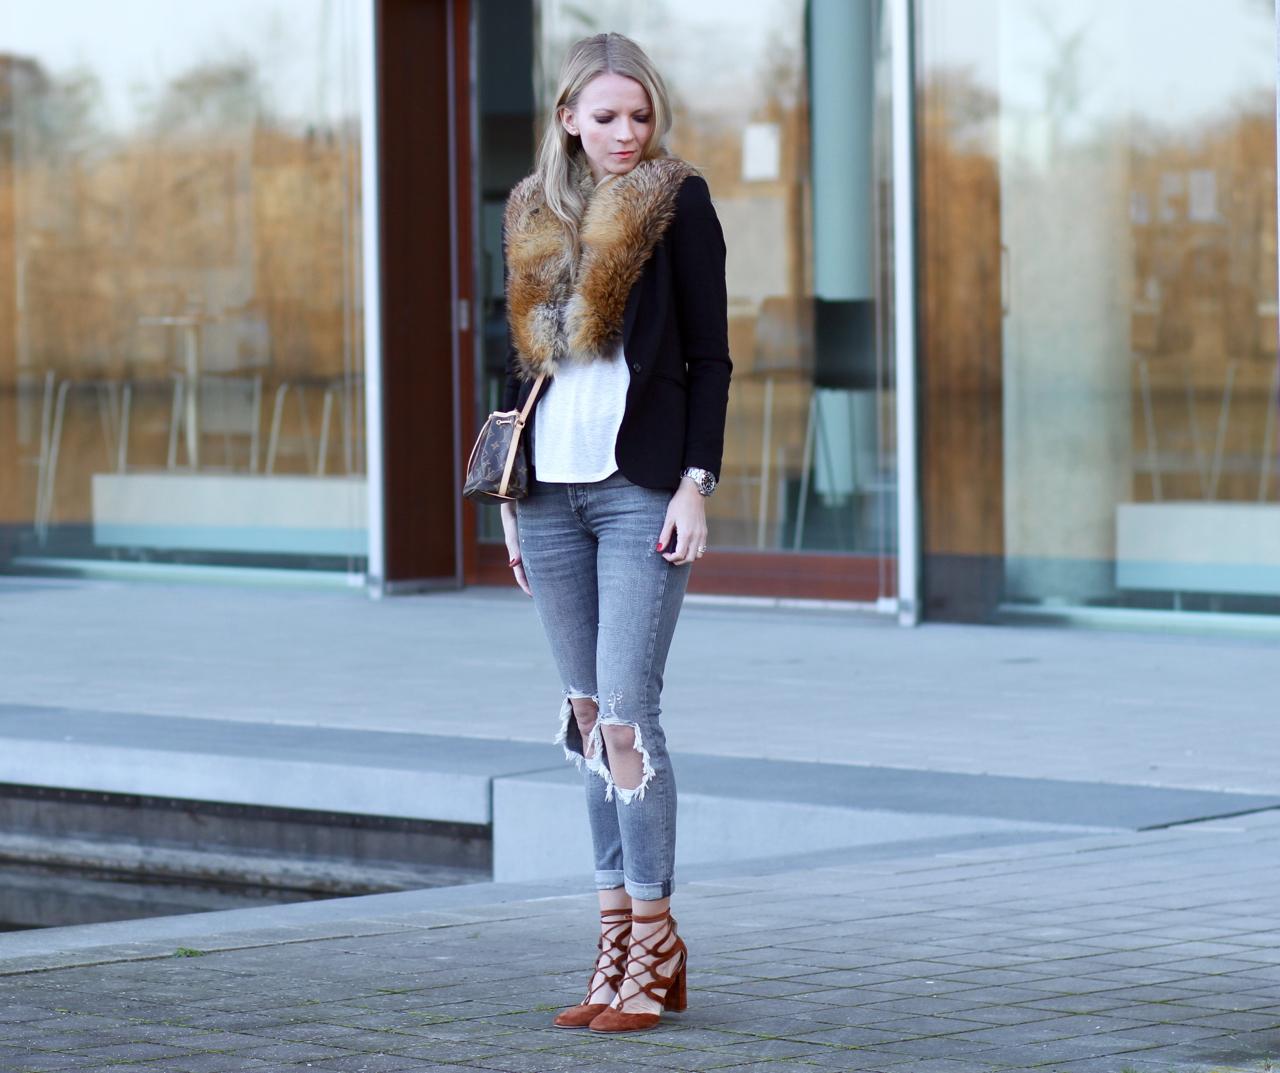 Herbstoutfit in Schwarz und Camel mit Vintage Pelz Fur Fashion Lifestyle Outfit Jennifer Zara Prego Cos H&M Munichblogger München Herbst Fall Autumn Jennifer PepperAndGold RippedJeans Jeans Casual Denim